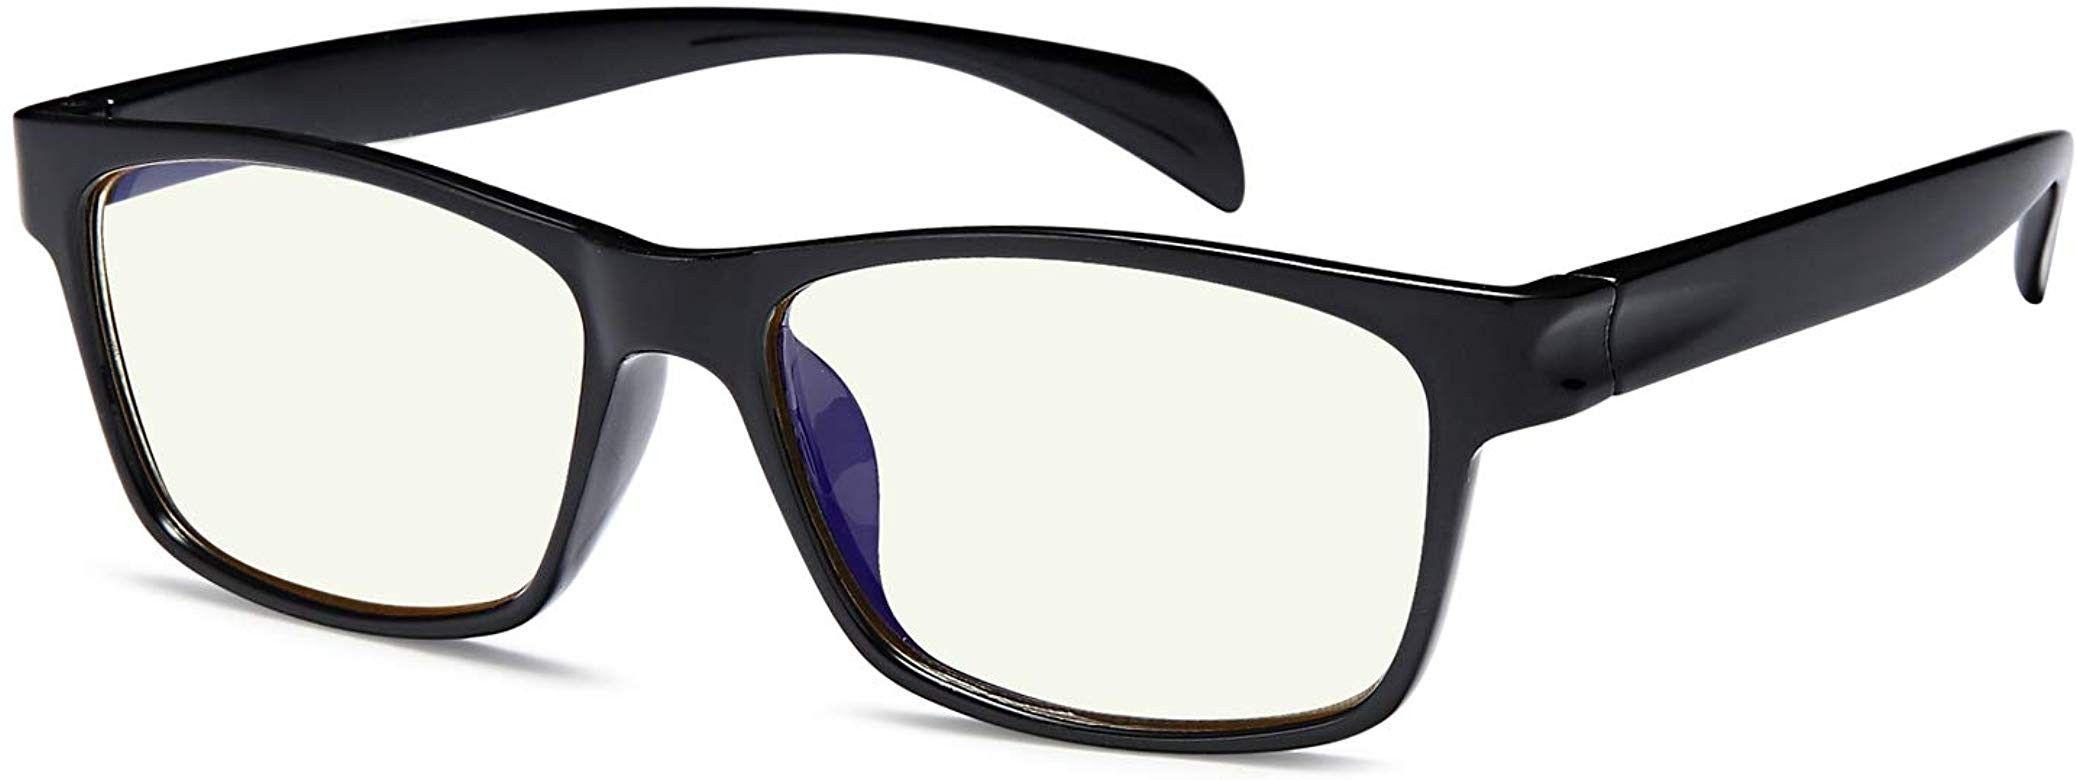 Gamma Ray Blue Light Blocking Glasses Amber Tint Anti